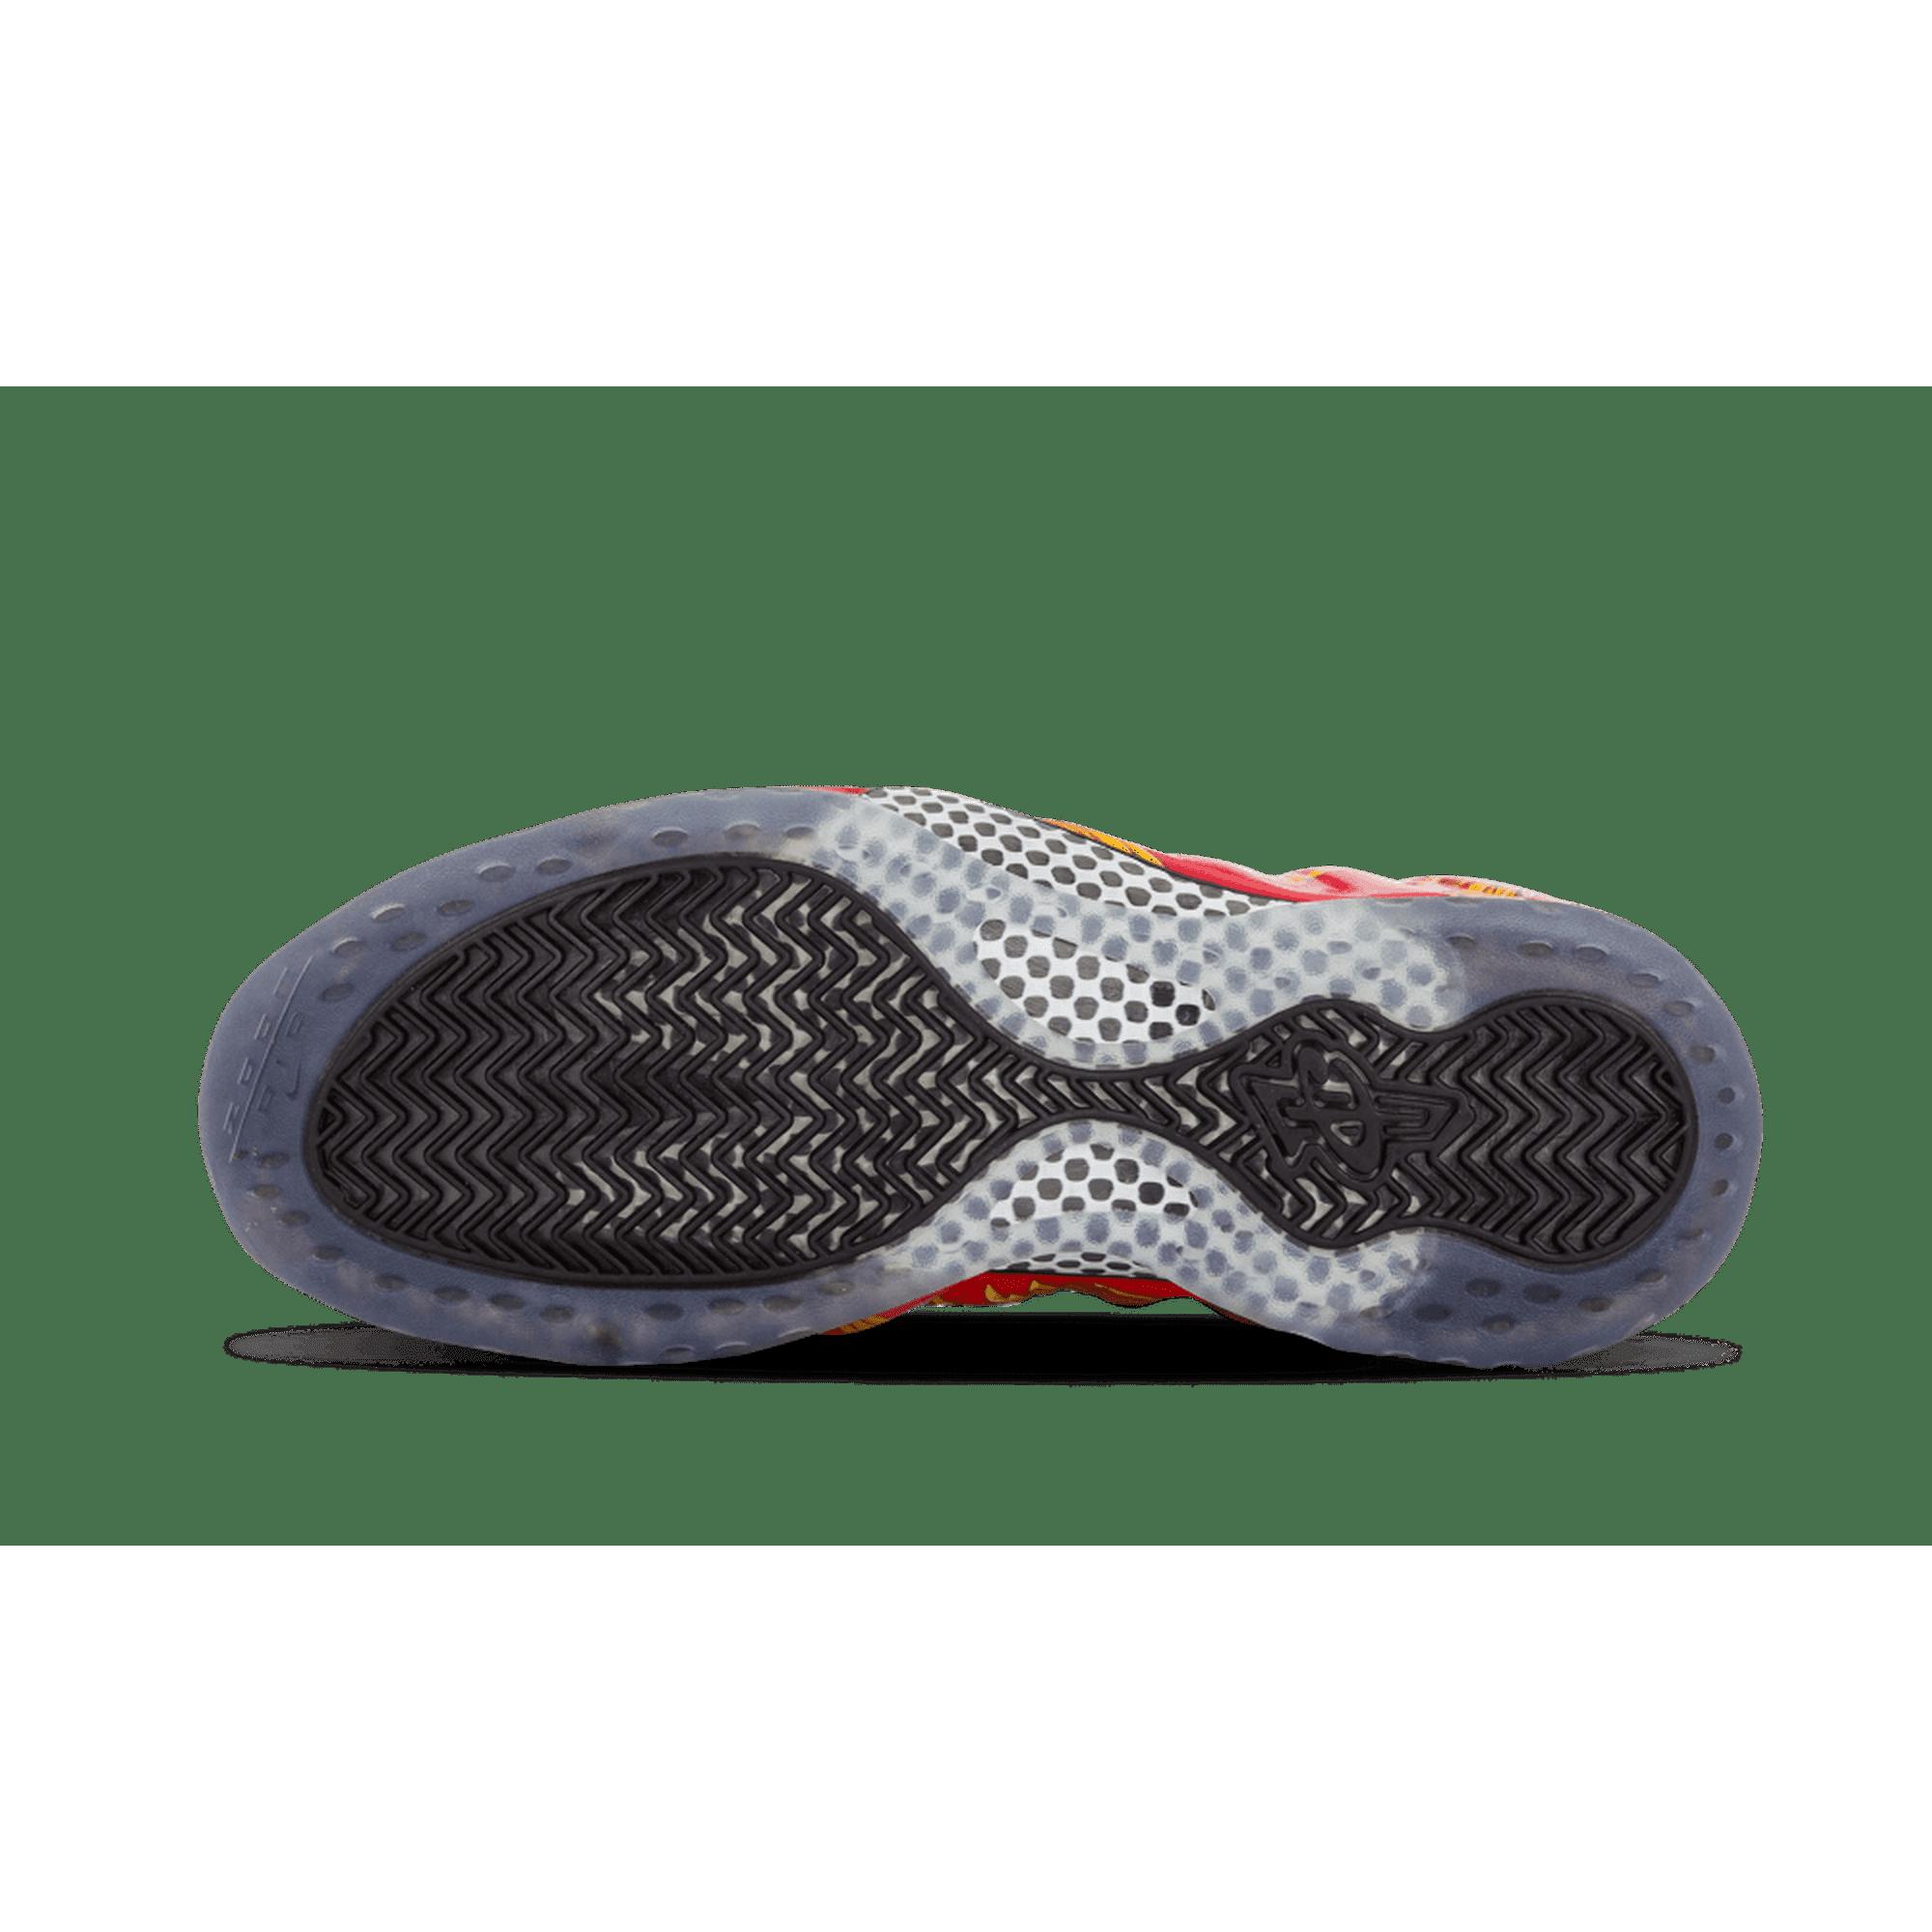 689311afc87ce Nike - Men - Nike Air Foamposite 1 Supreme Sp Red  Supreme  - 652792-600 -  Size 13